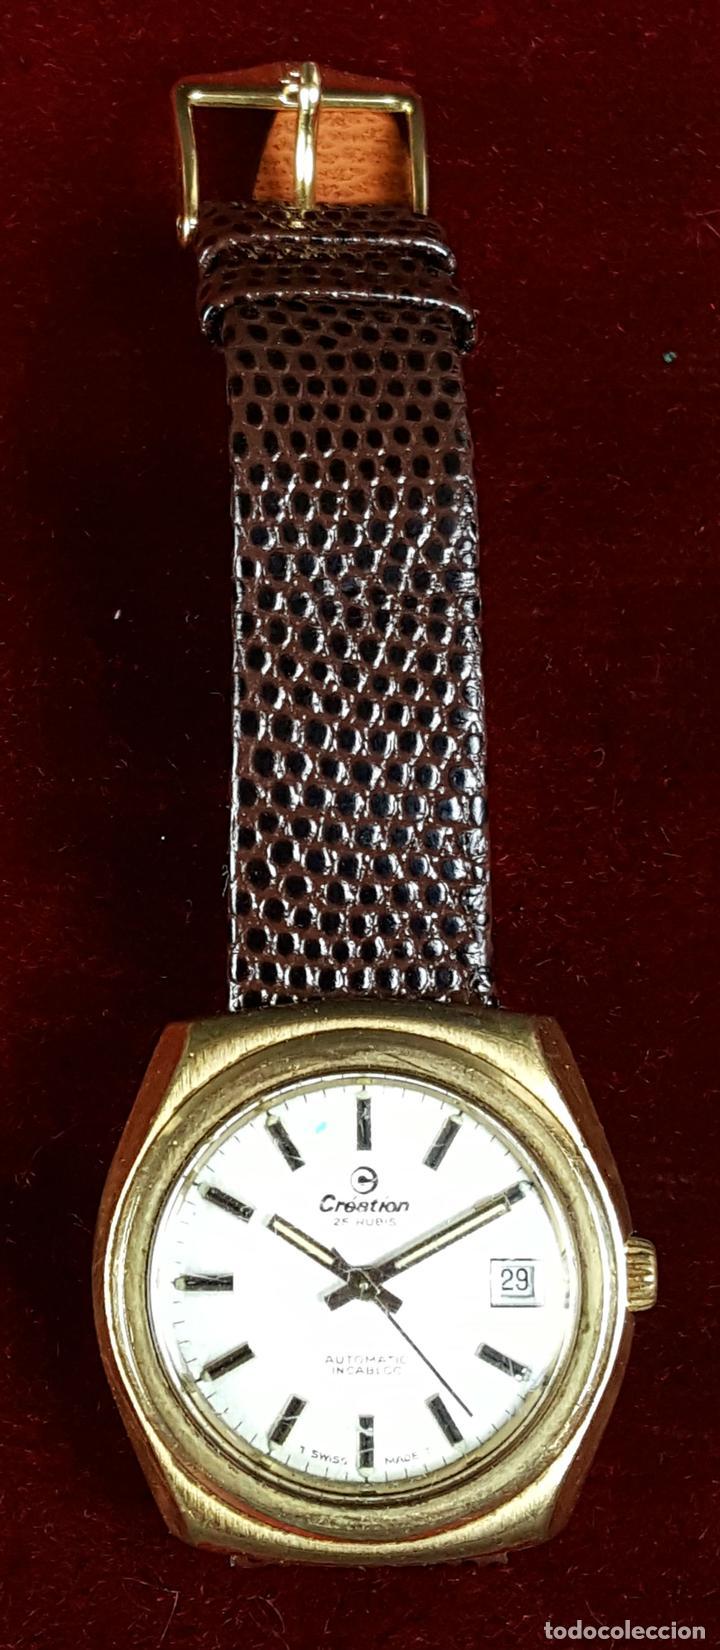 RELOJ DE PULSERA. CREATION. 25 RUBIS. CAJA CHAPADA EN ORO. AUTOMATICO. CIRCA 1970 (Relojes - Pulsera Carga Manual)